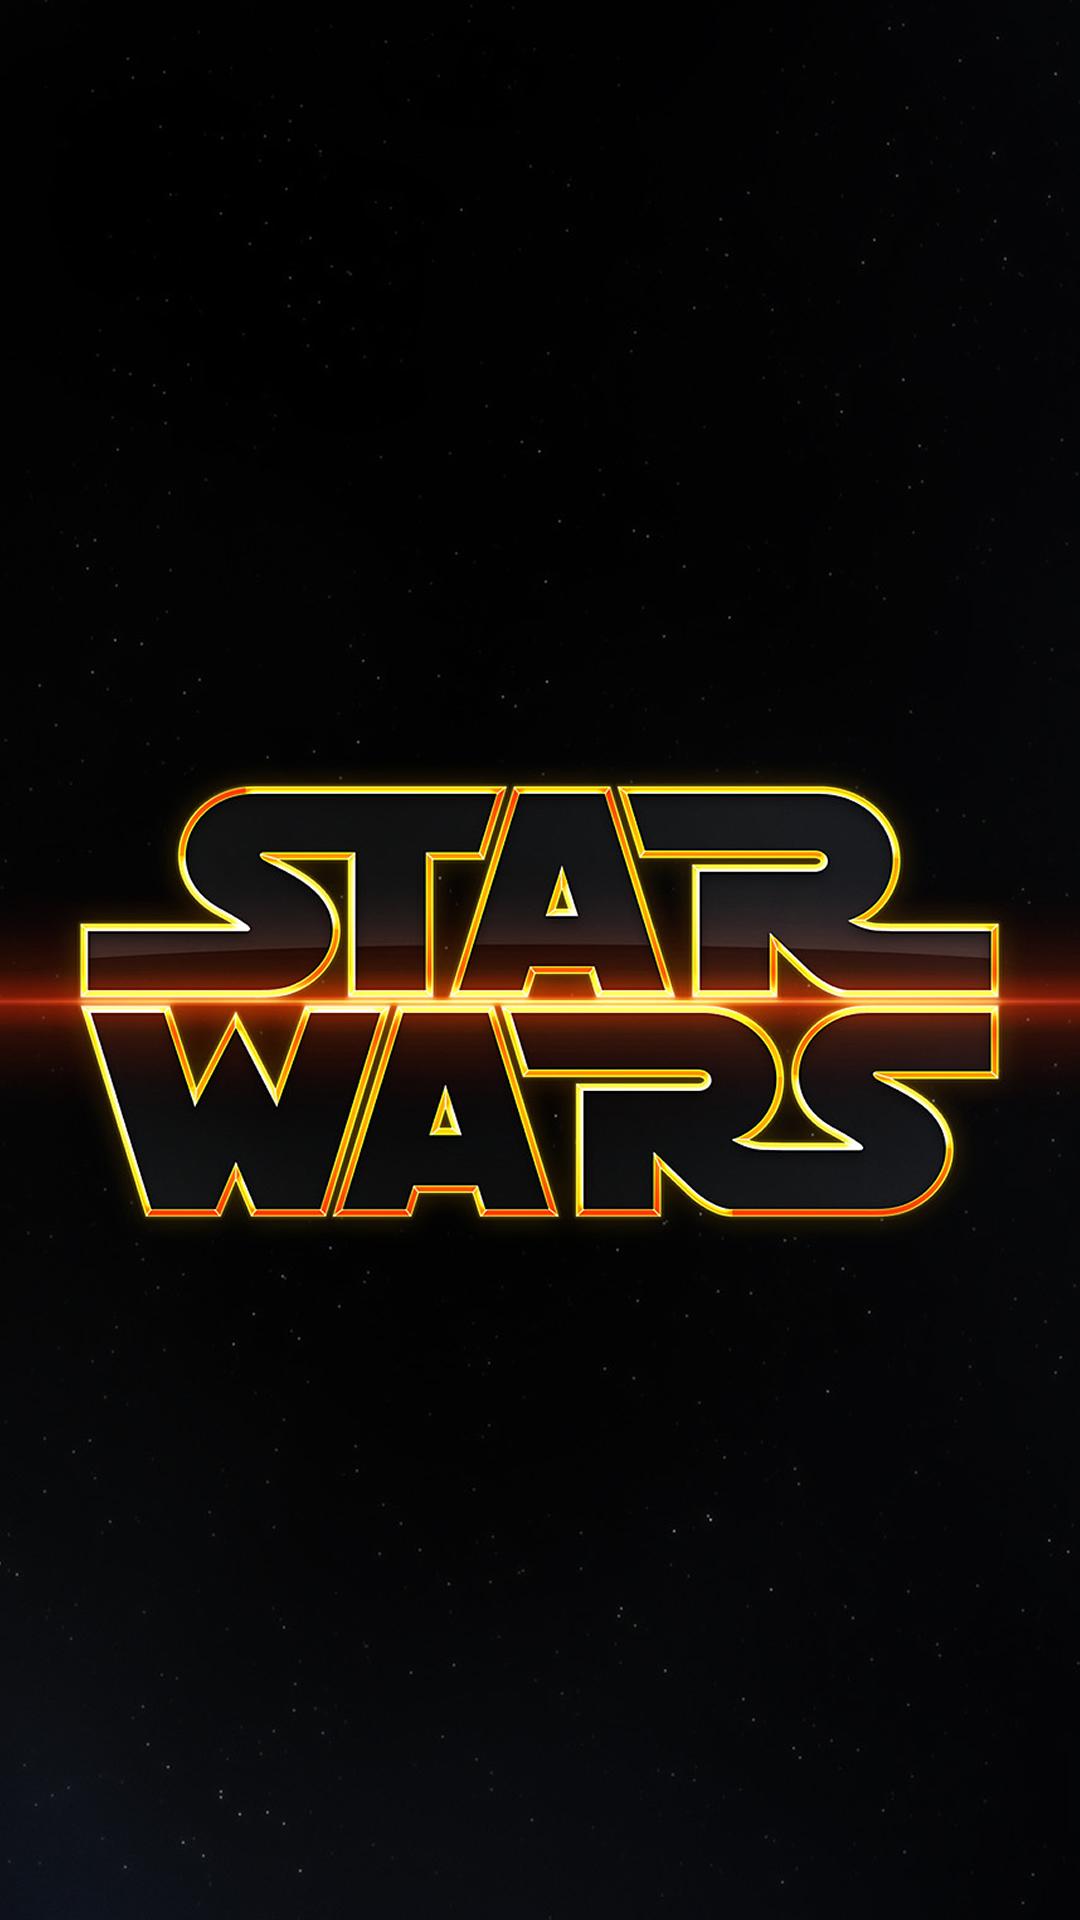 Star-Wars-Iphone-Wallpaper-Vs87r.jpg